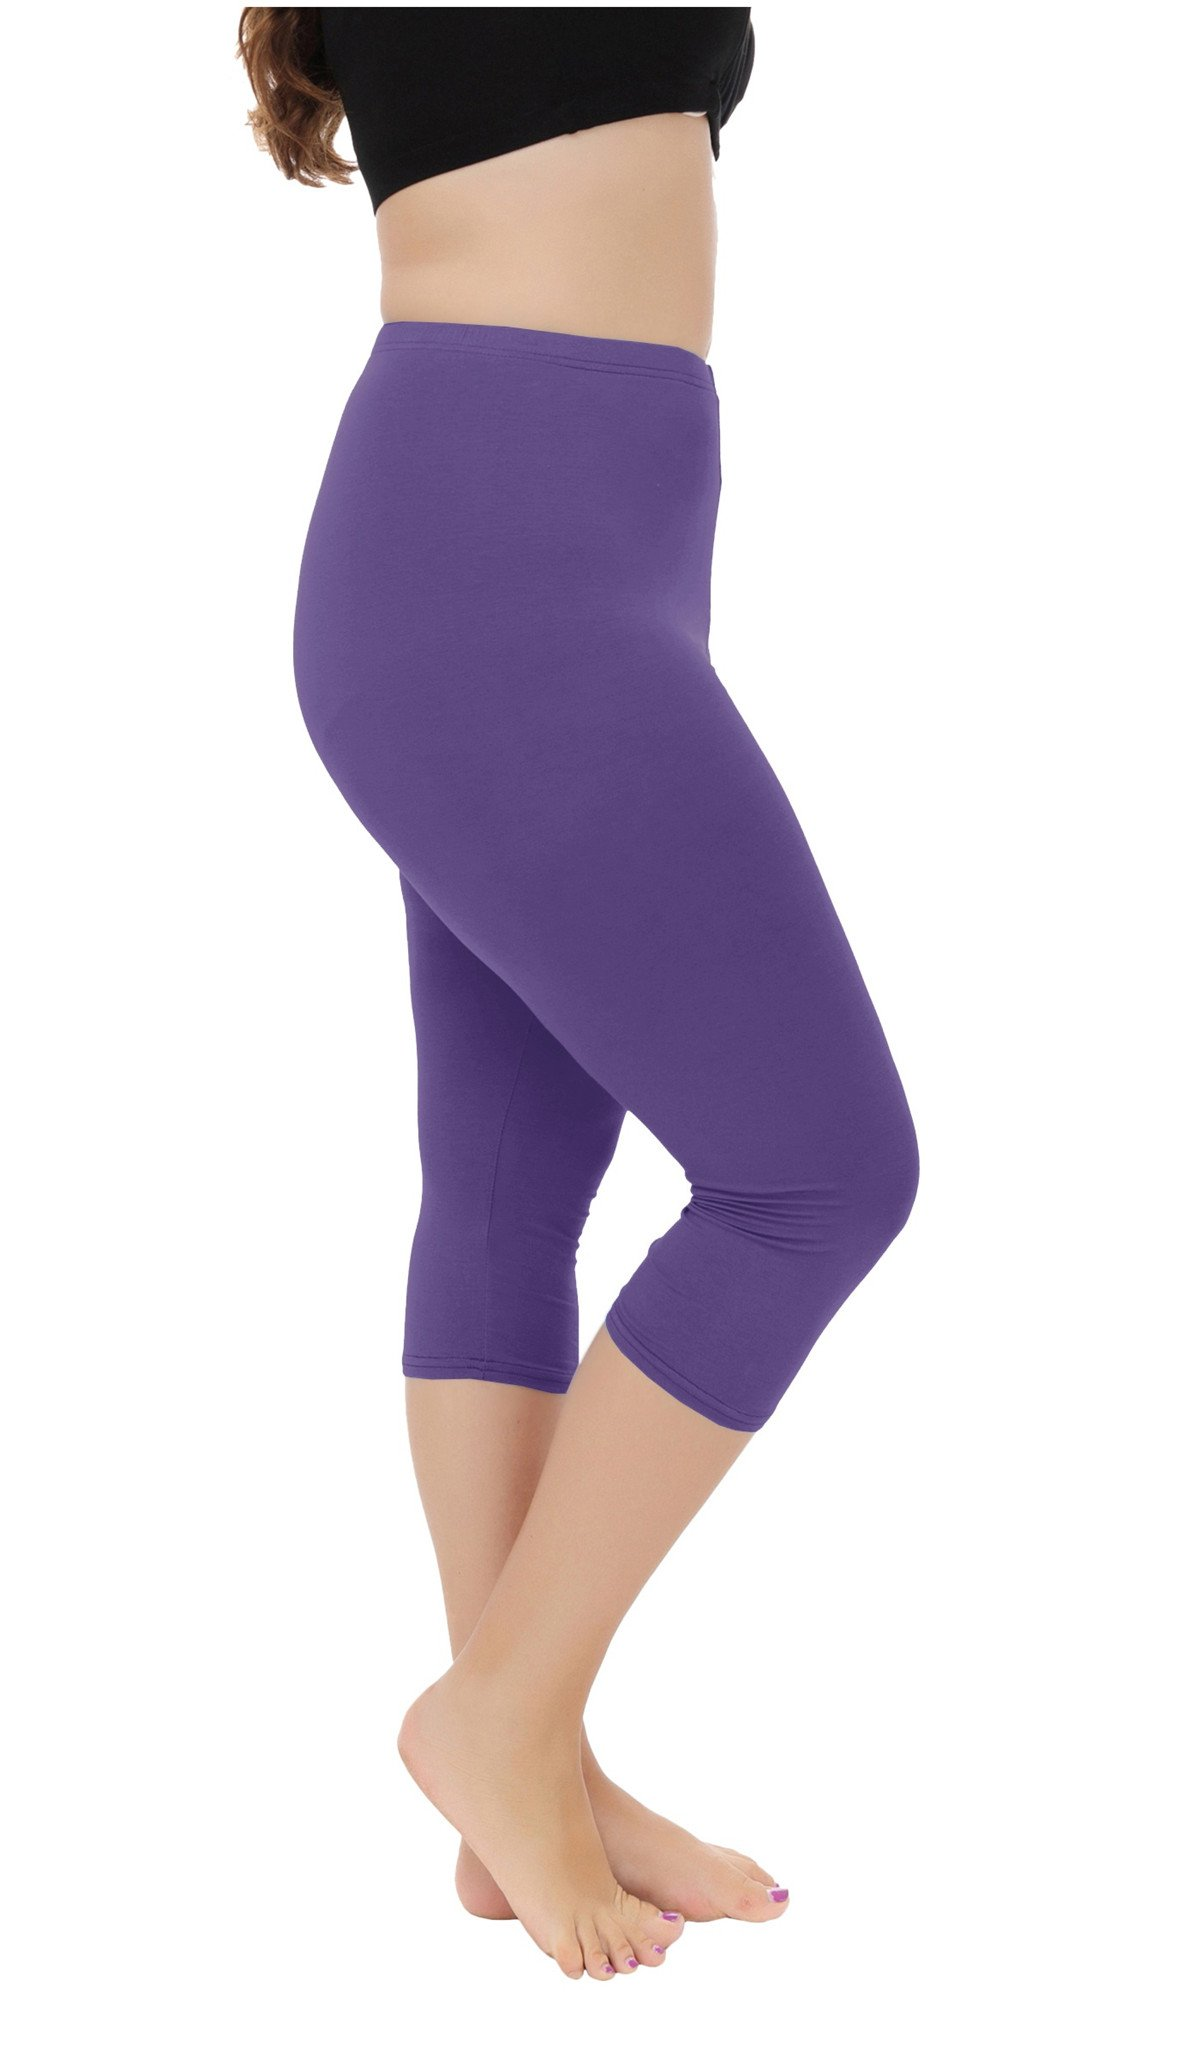 Cheapestbuy Vangee Women's Summer Light Weight Soft Plus Size Capri Leggings Cropped 3/4 Pants